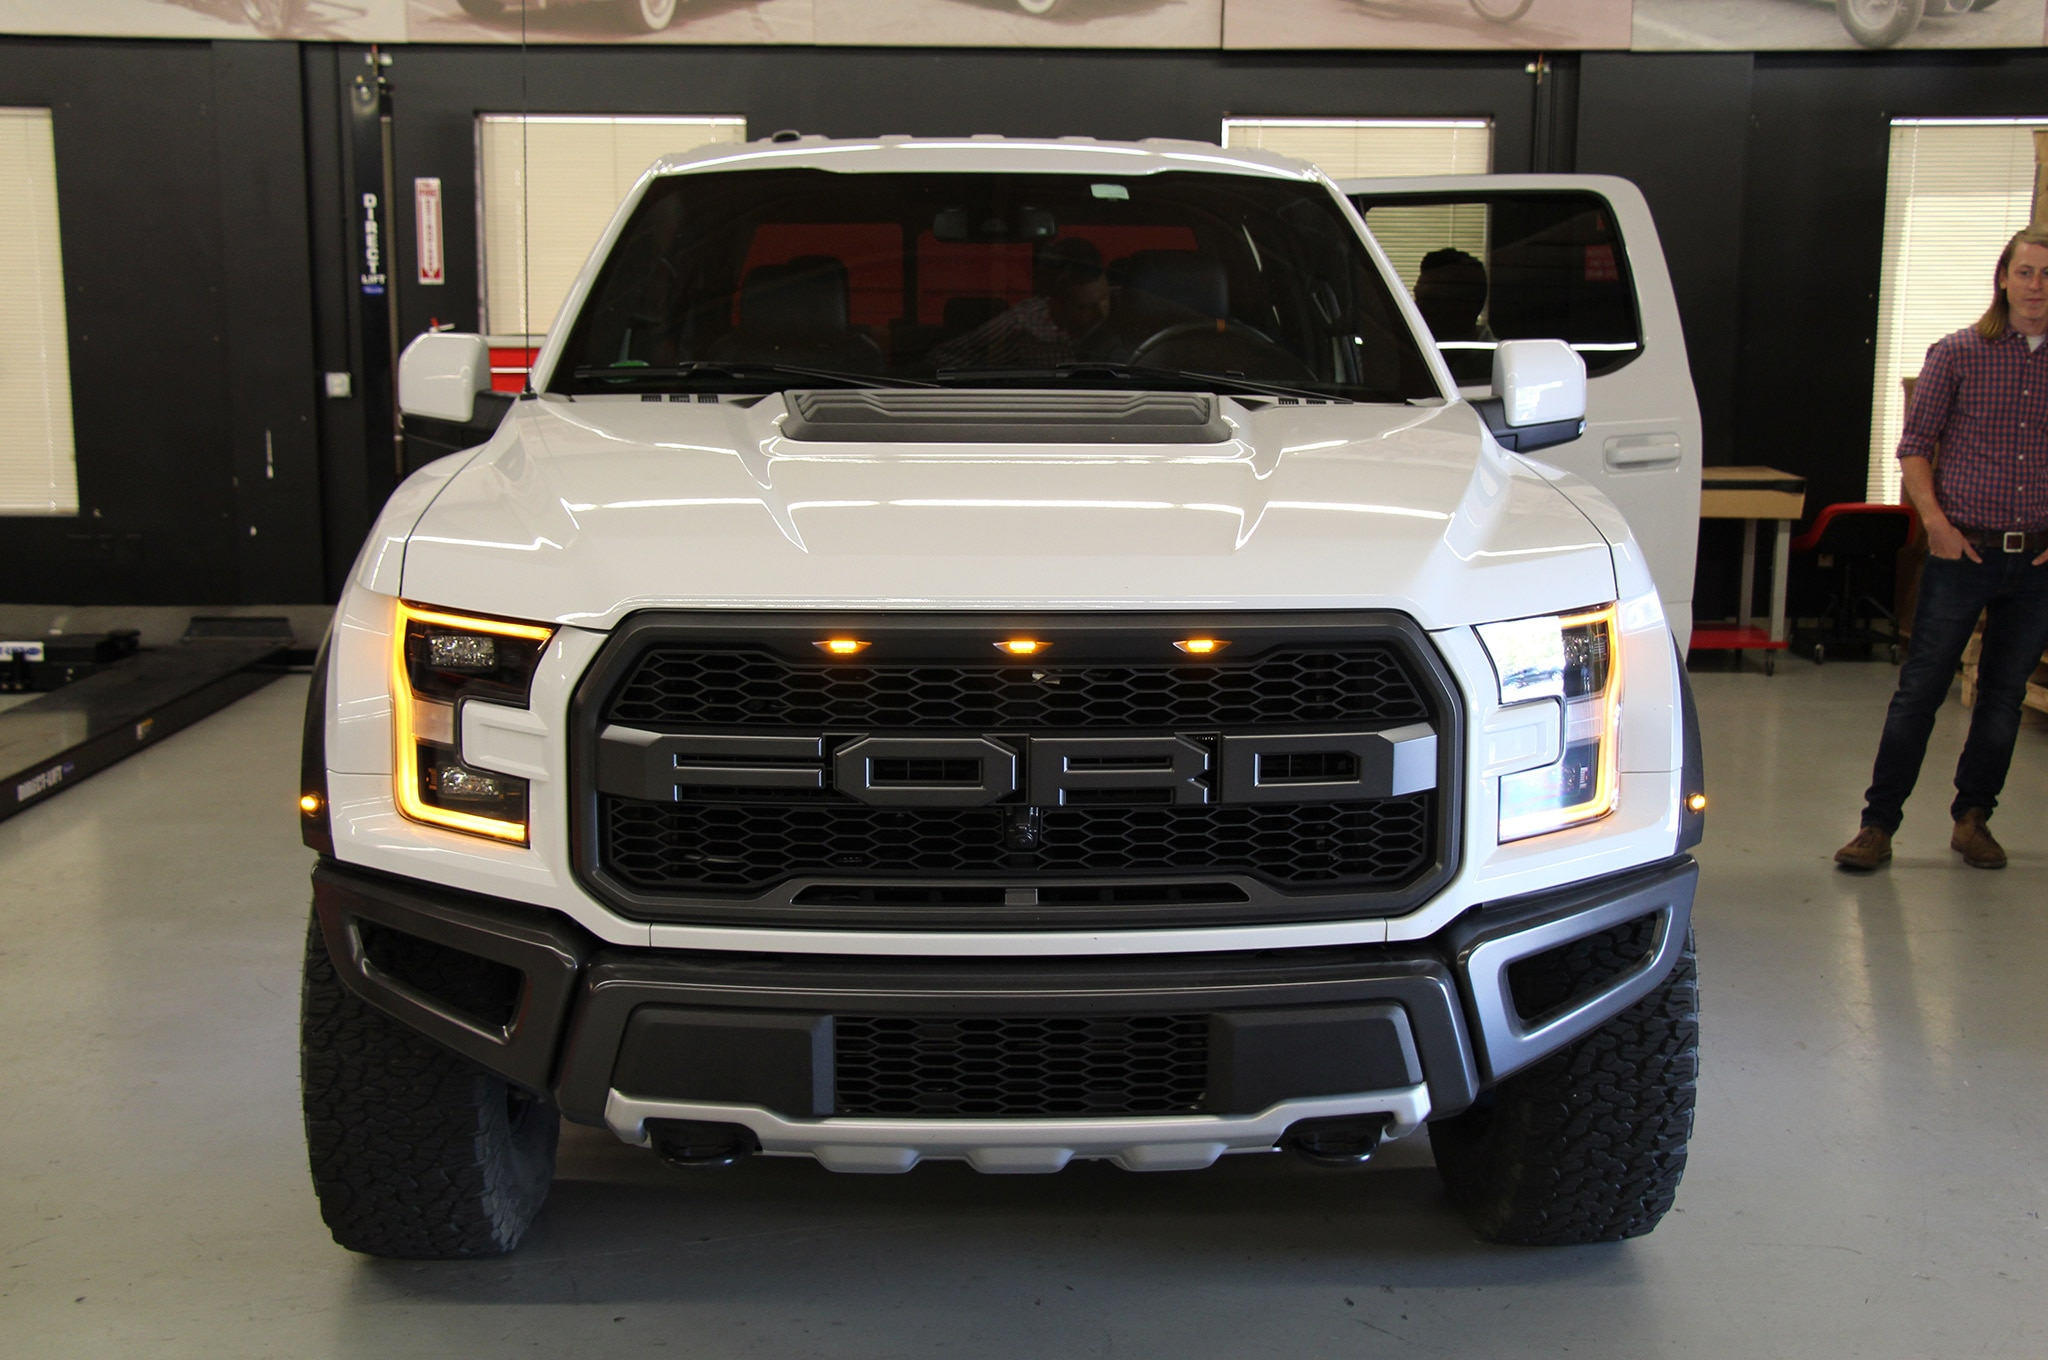 Ford Raptor 2017 Produce 450 Caballos De Fuerza Motor